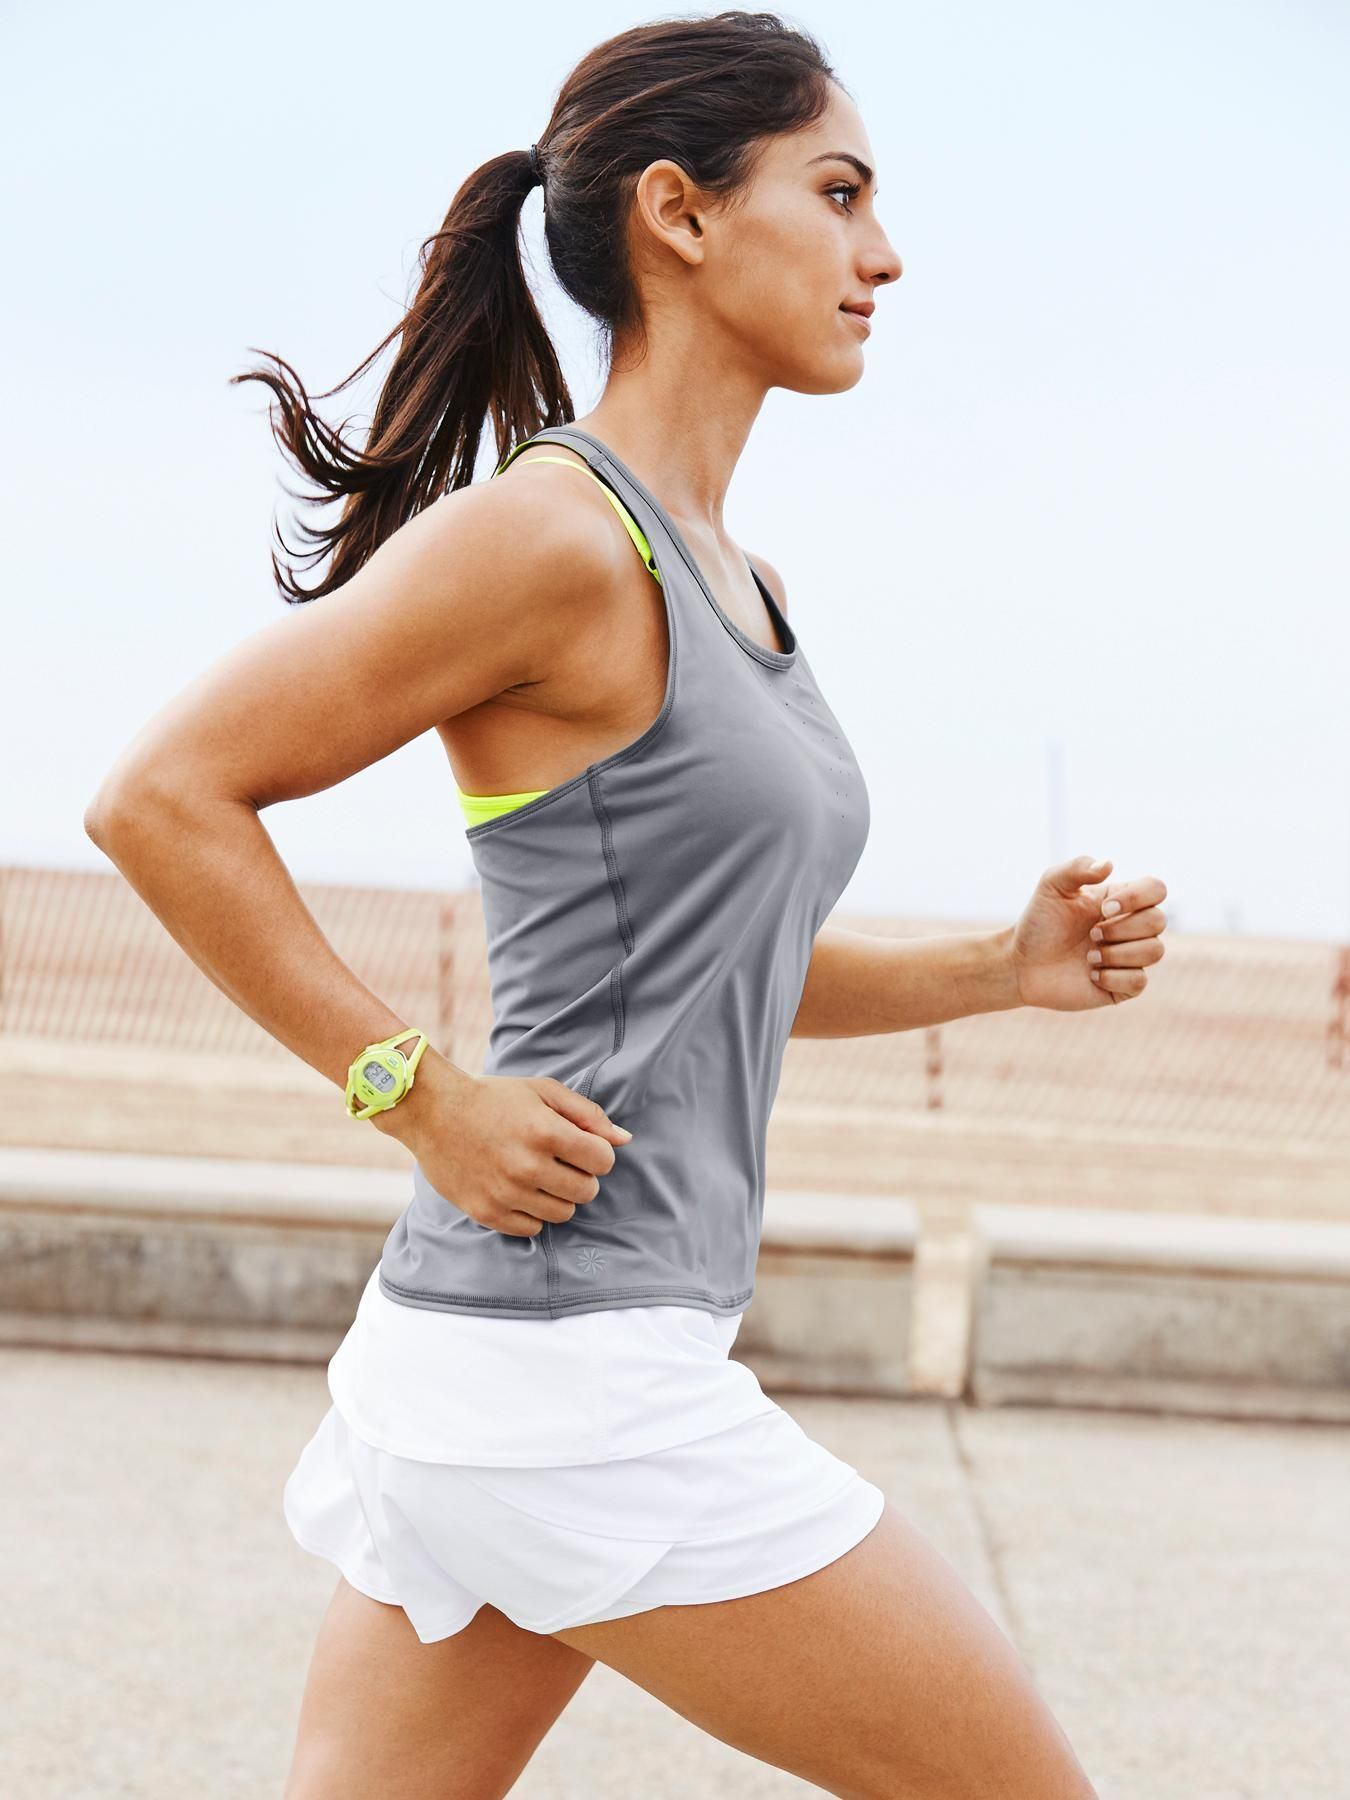 Allison Stokke - Imgur  Women And Sports  Gym Shorts -4719